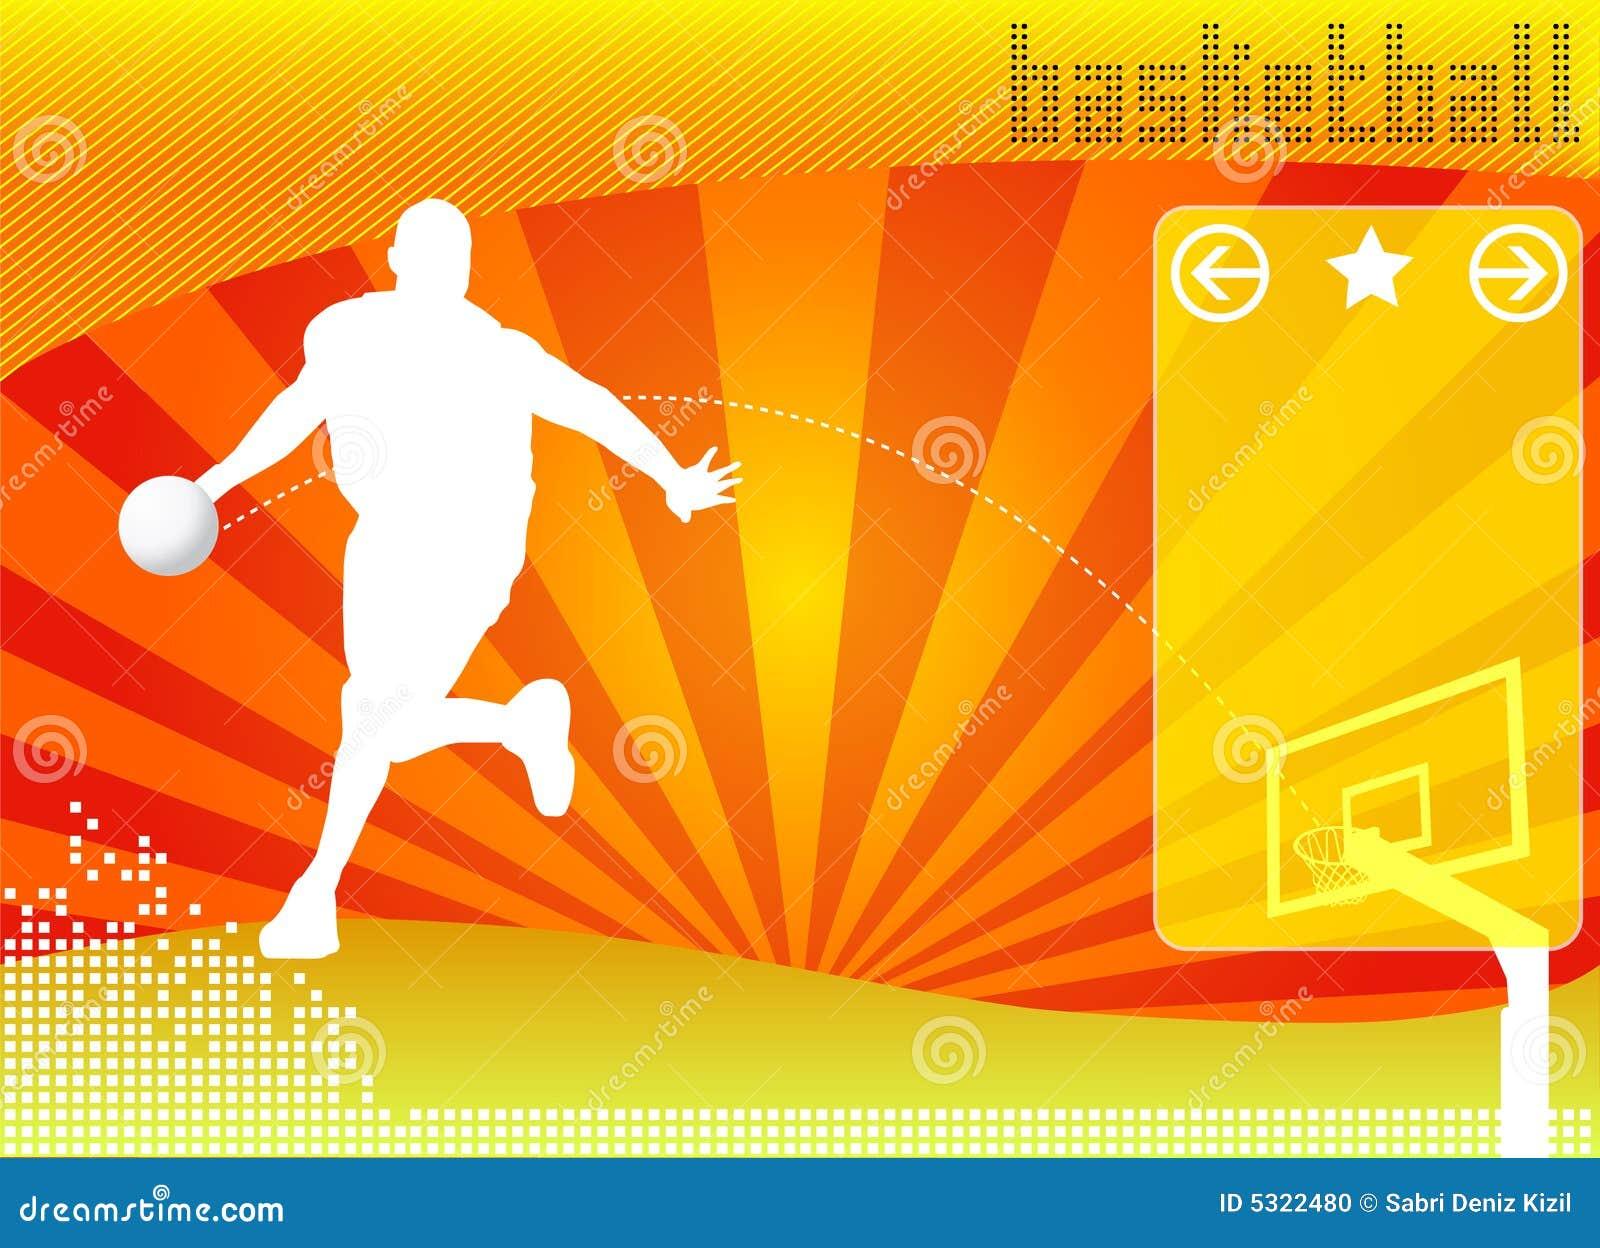 Vetor do fundo do conceito do basquetebol